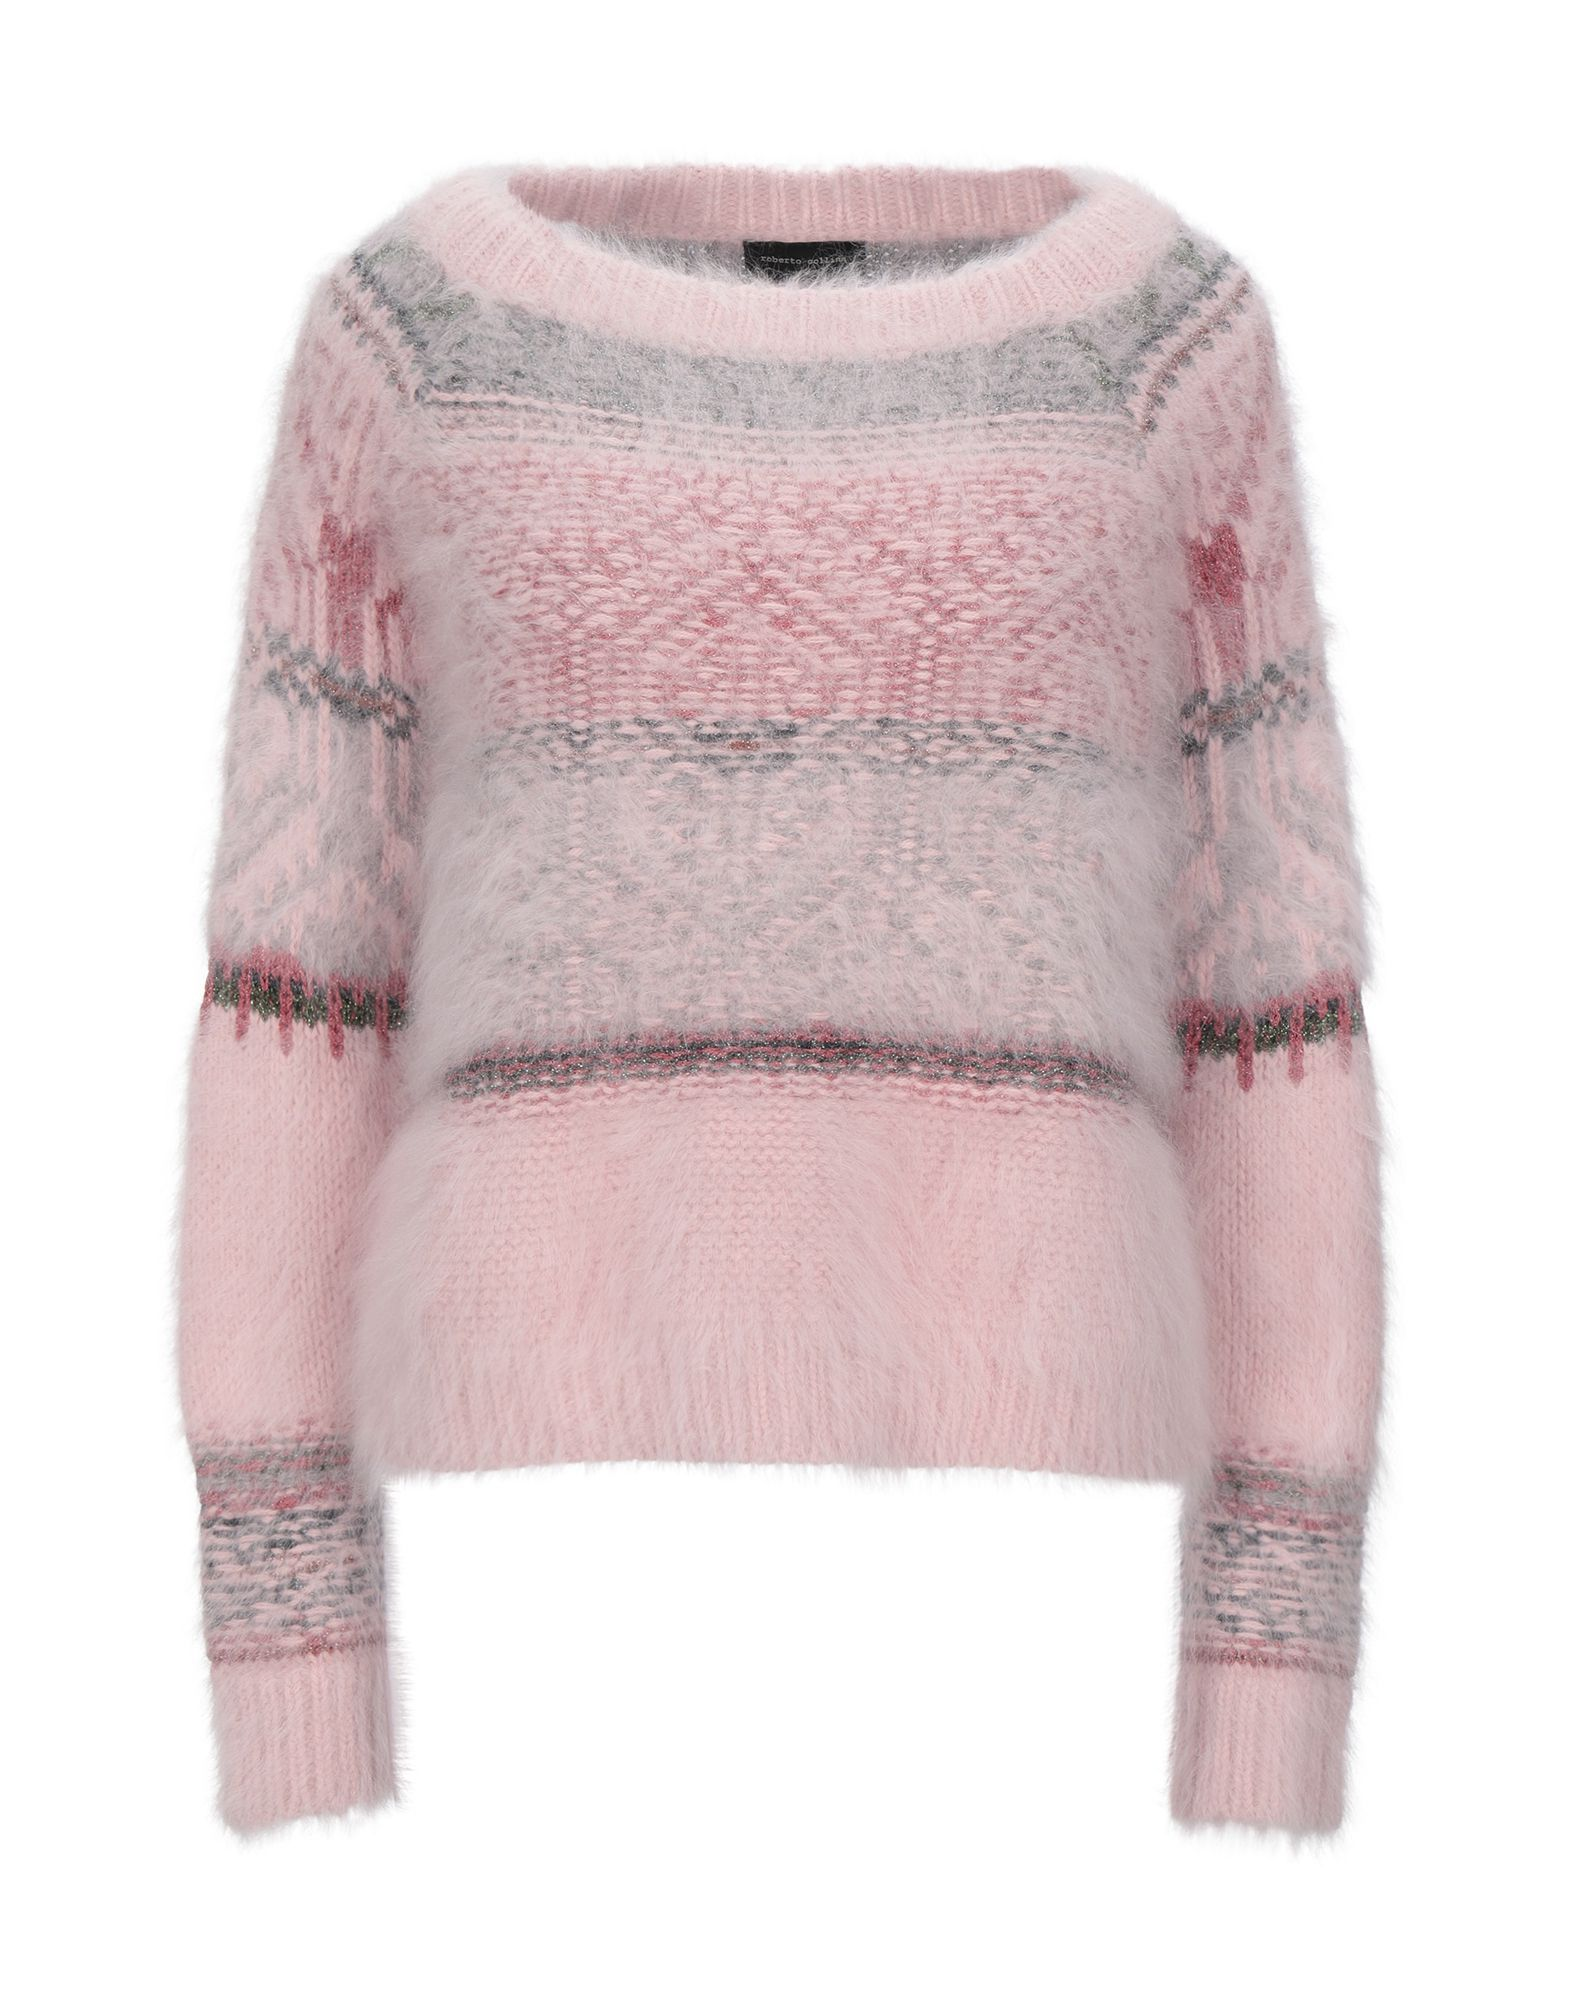 Roberto Collina Pink Stripe Angora Knit Jumper